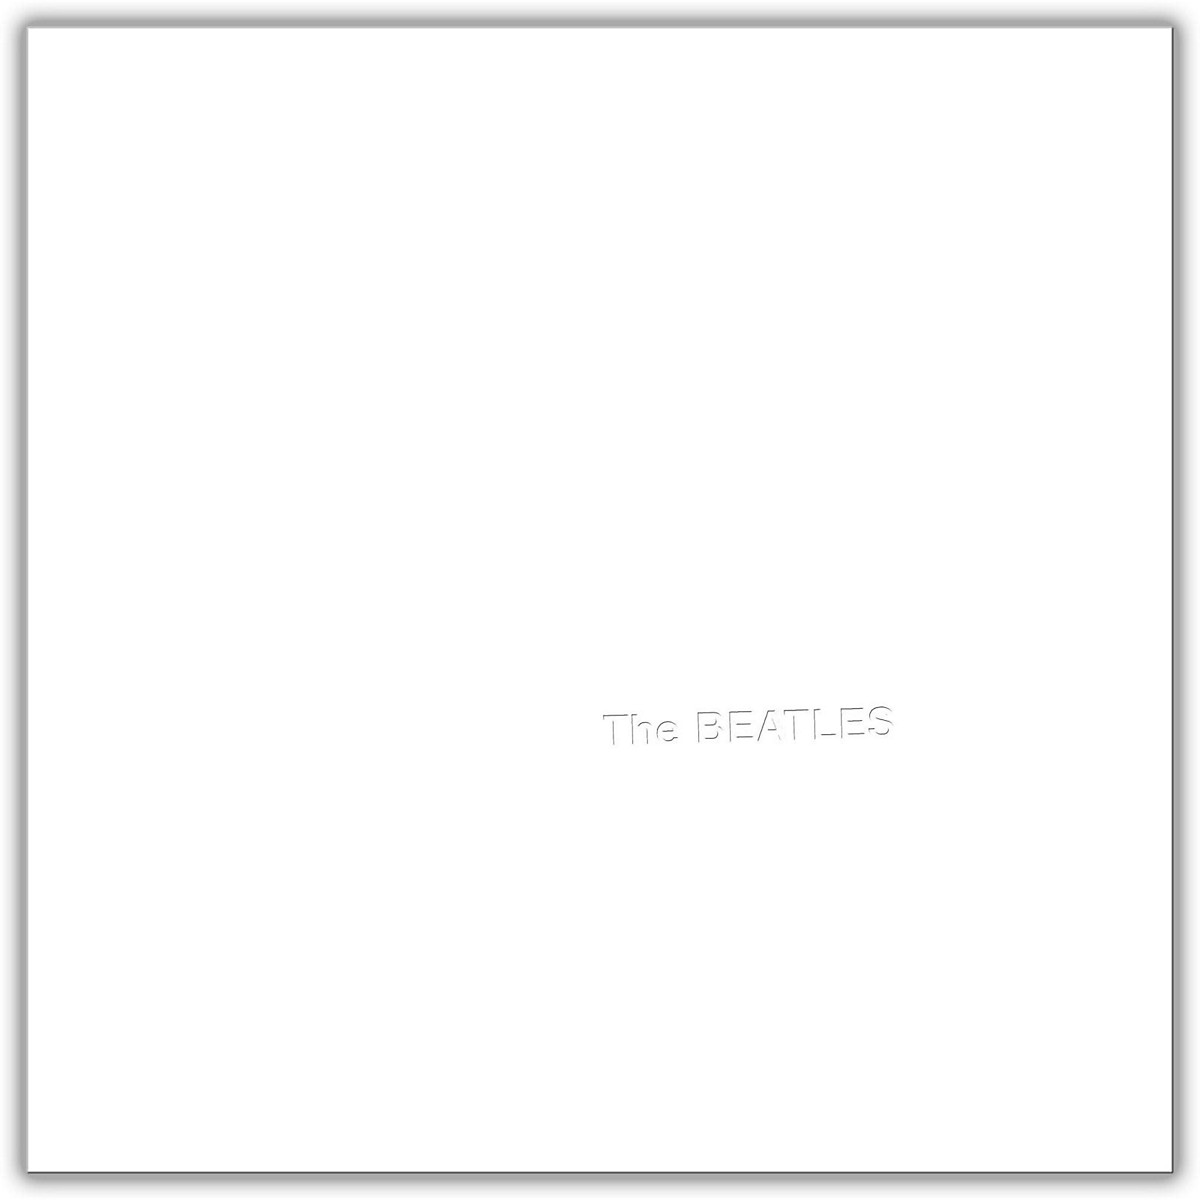 Universal Music Group The Beatles - The Beatles (White Album) Vinyl LP